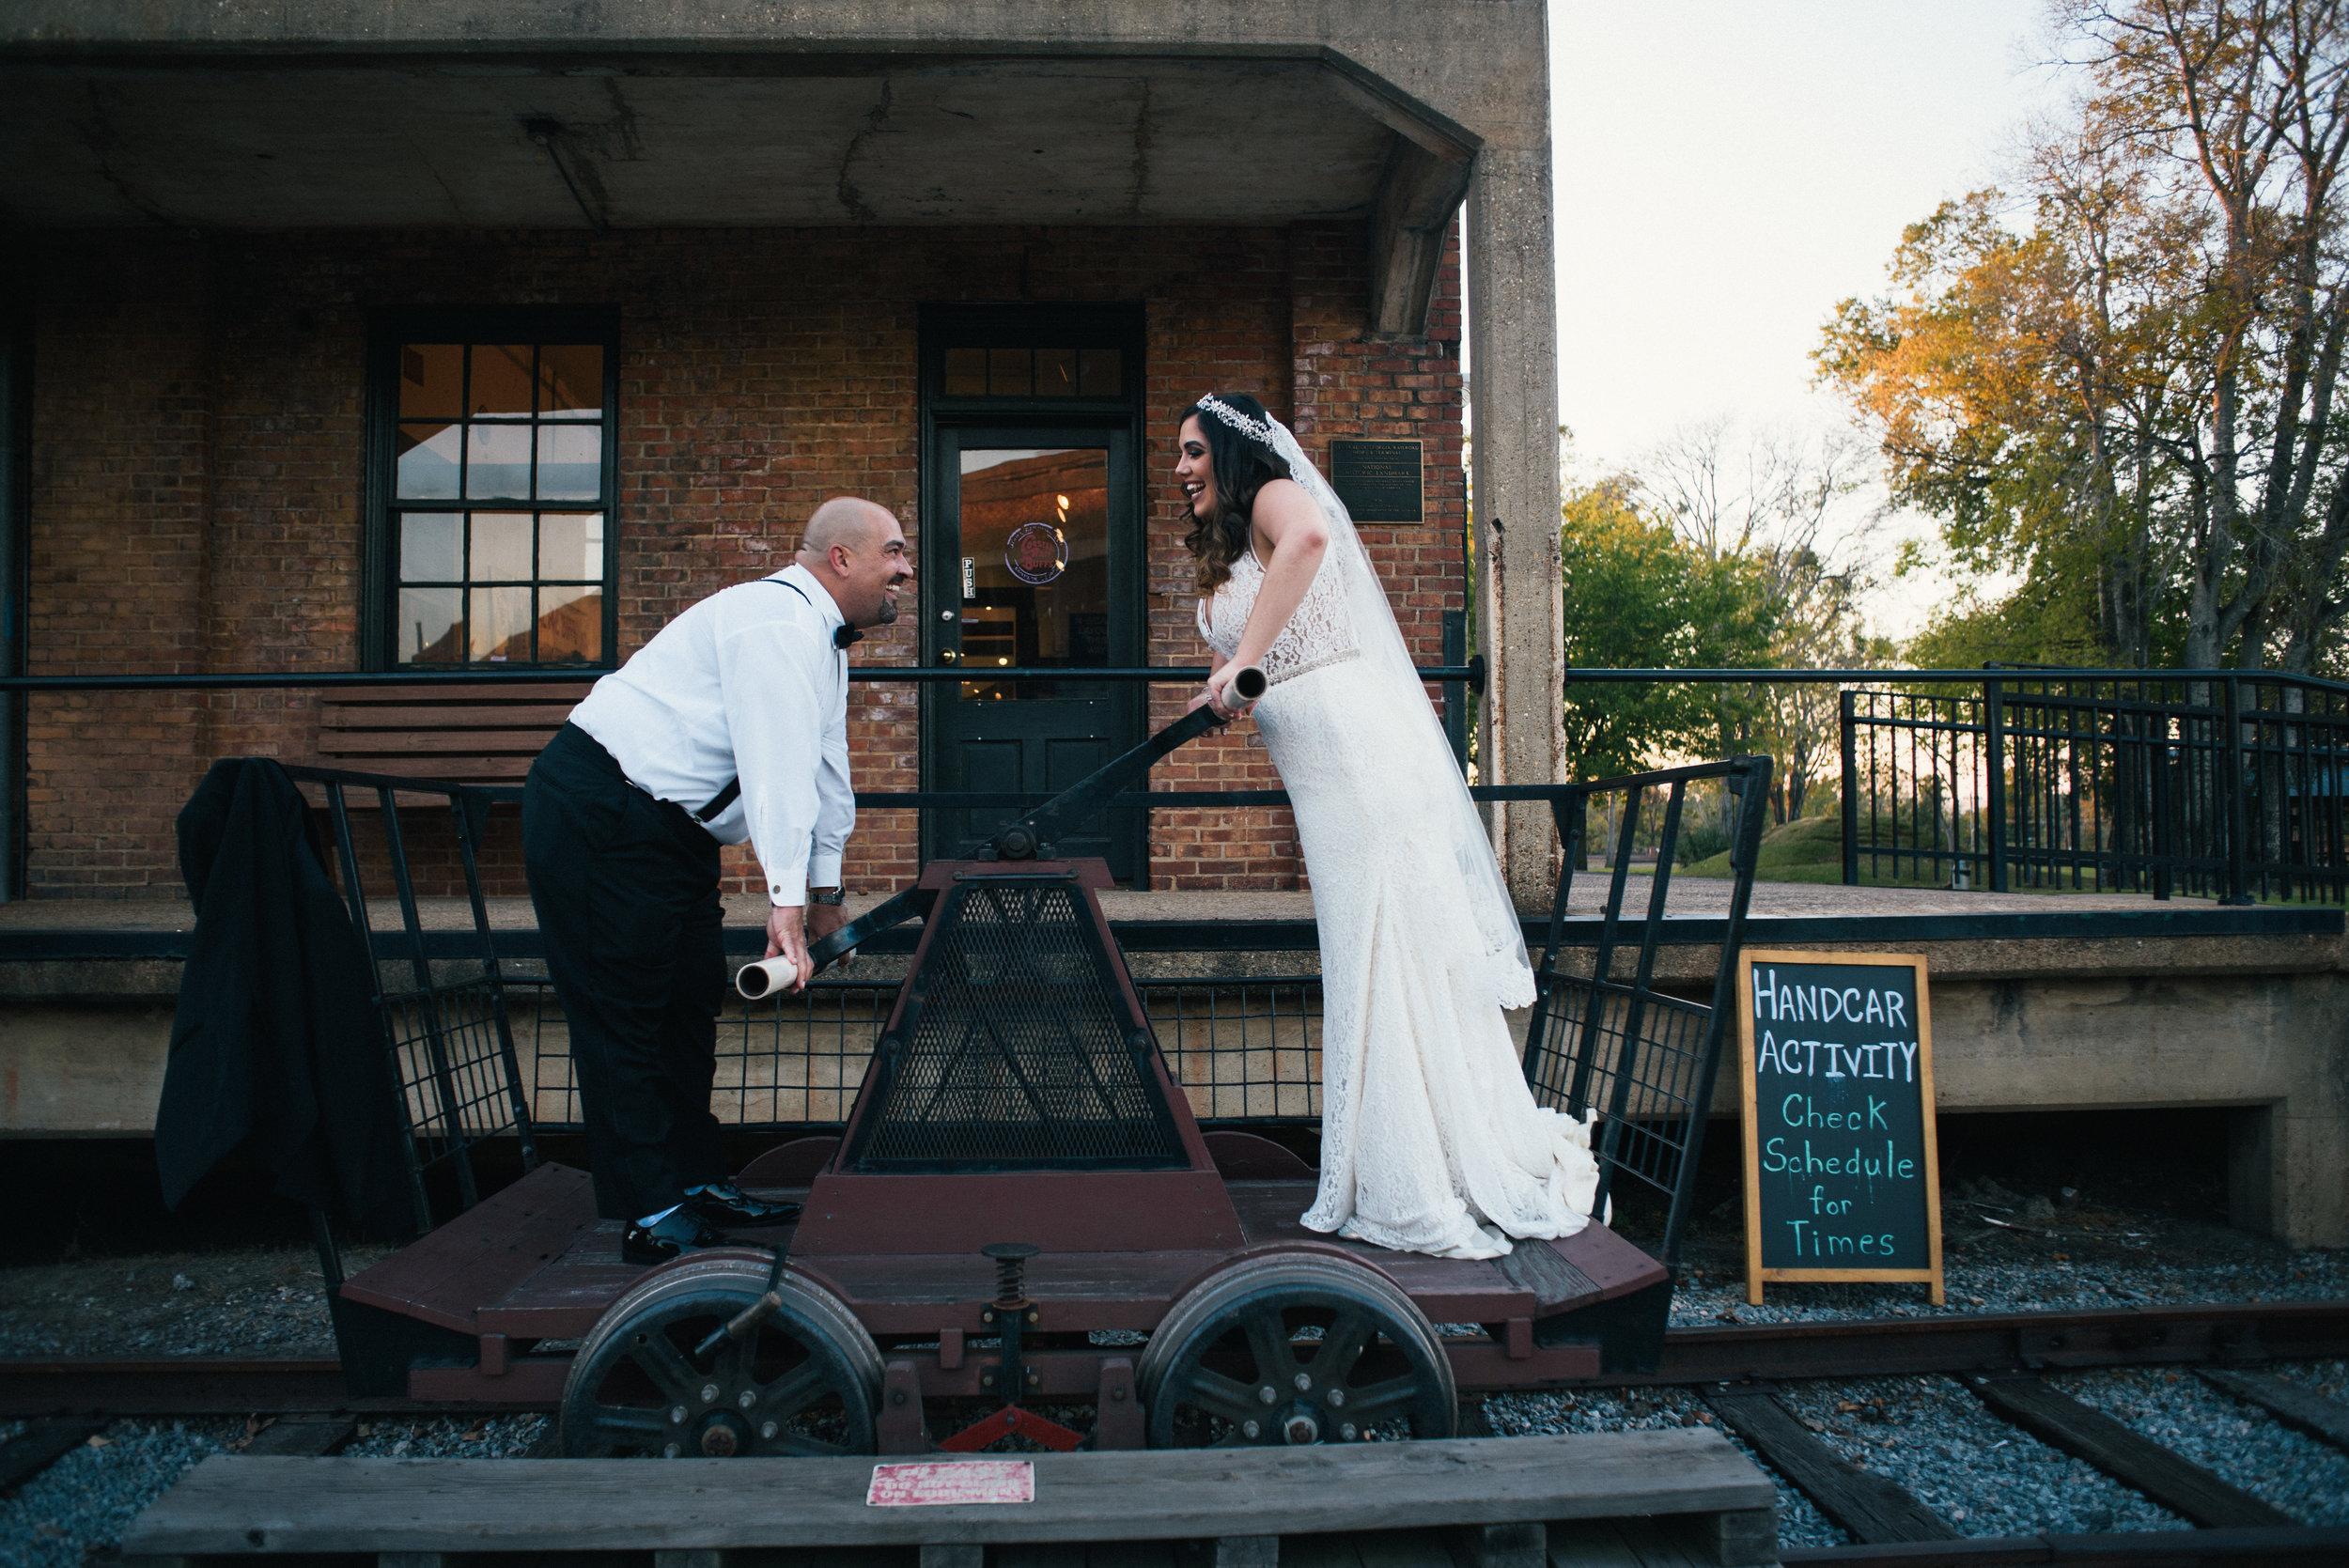 Iggy-and-yesenia-savannah-railroad-museum-wedding-meg-hill-photo- (717 of 1037).jpg